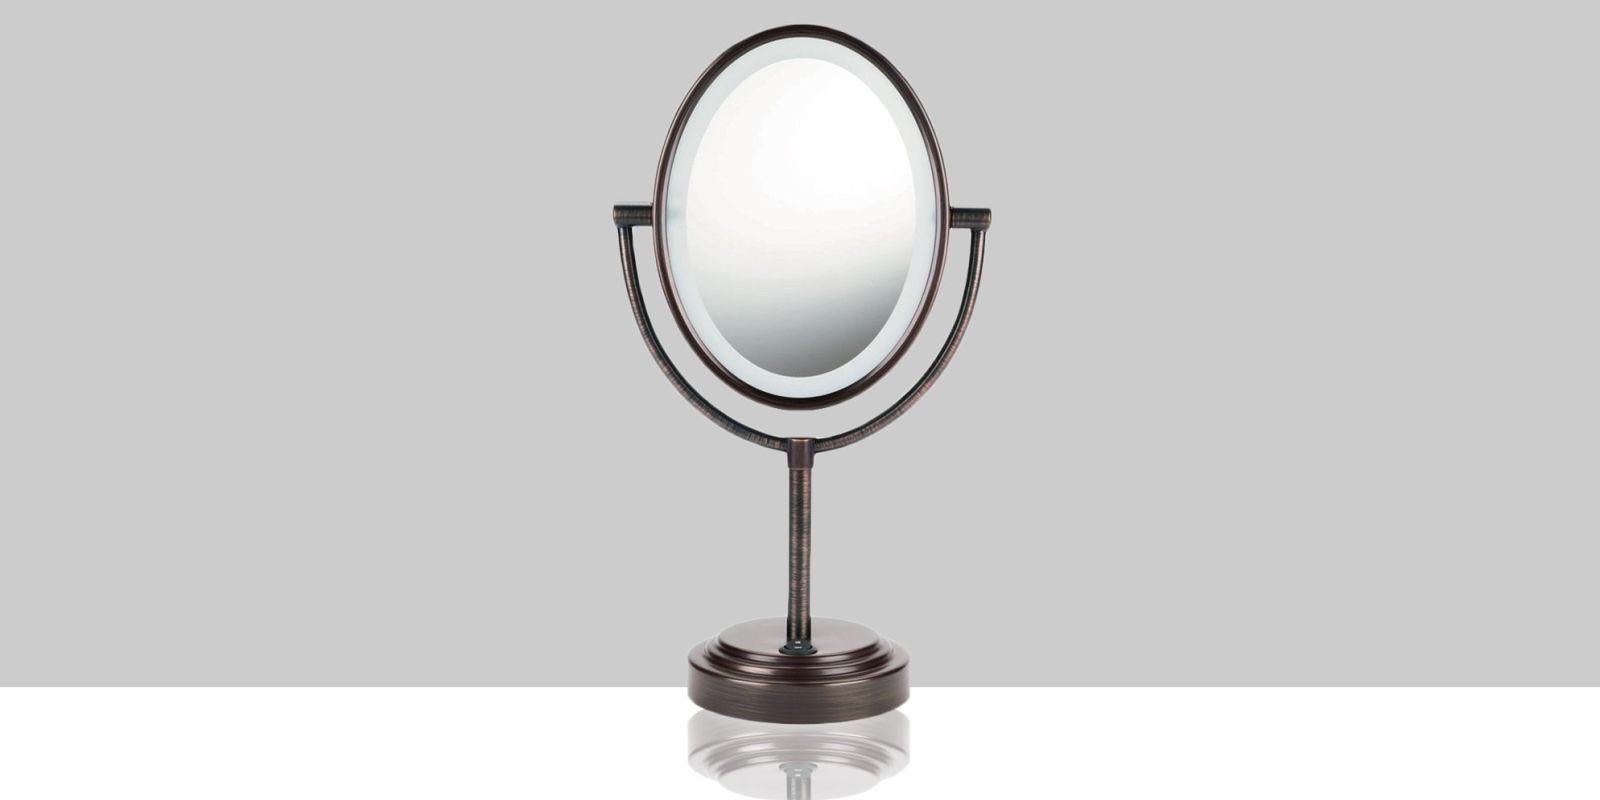 Best Lighted Makeup Mirror 2016  Makeup Vidalondon